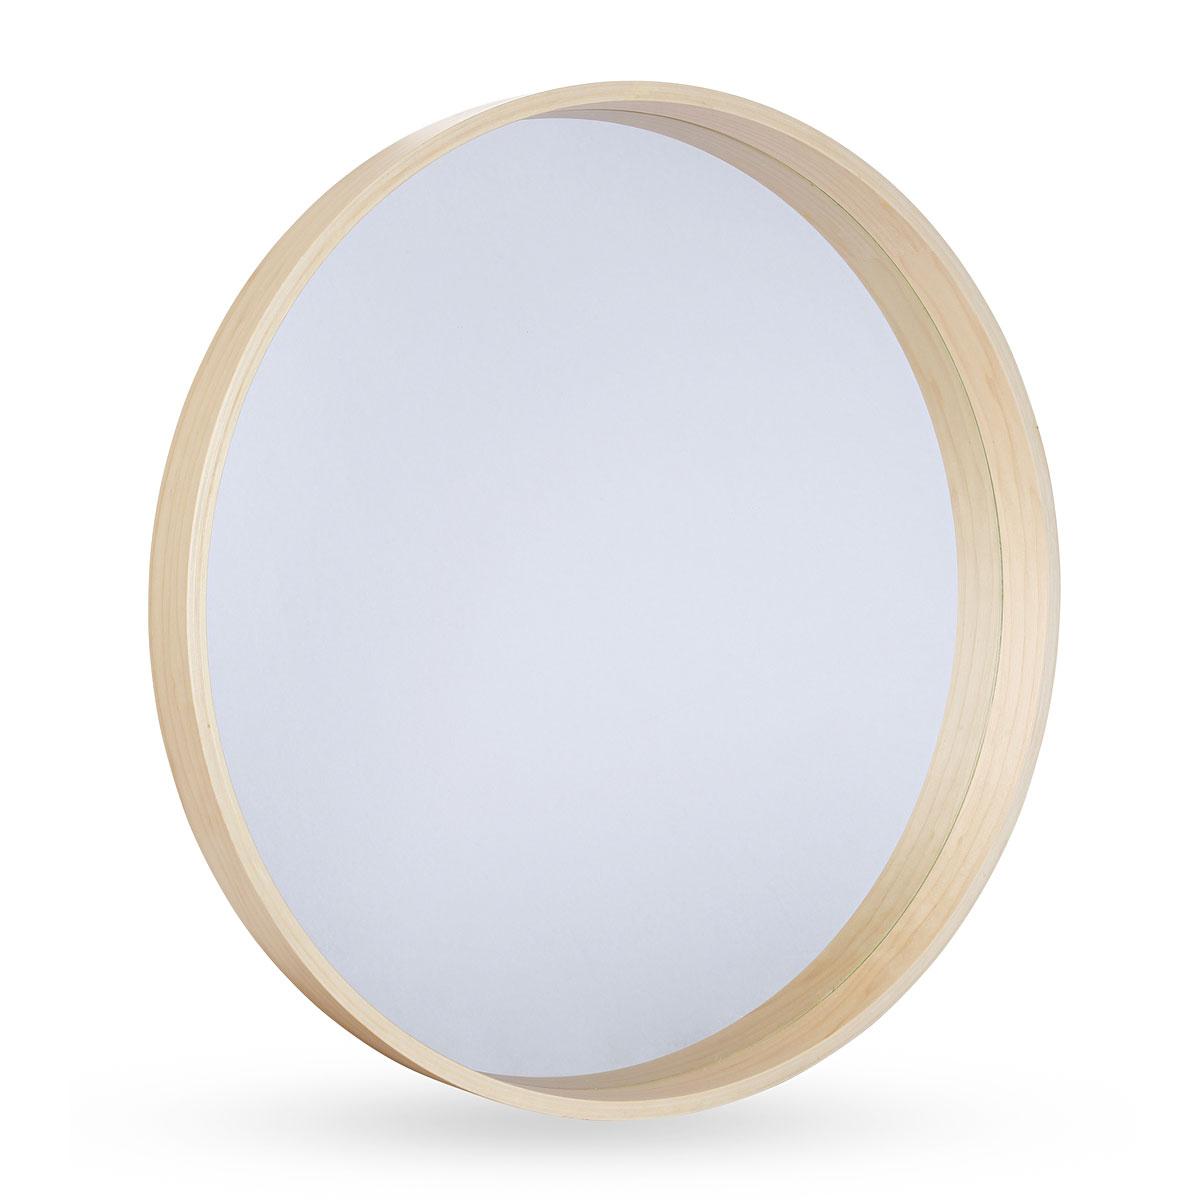 Buy Bathroom Mirrors Online in Australia   Luxe Mirrors